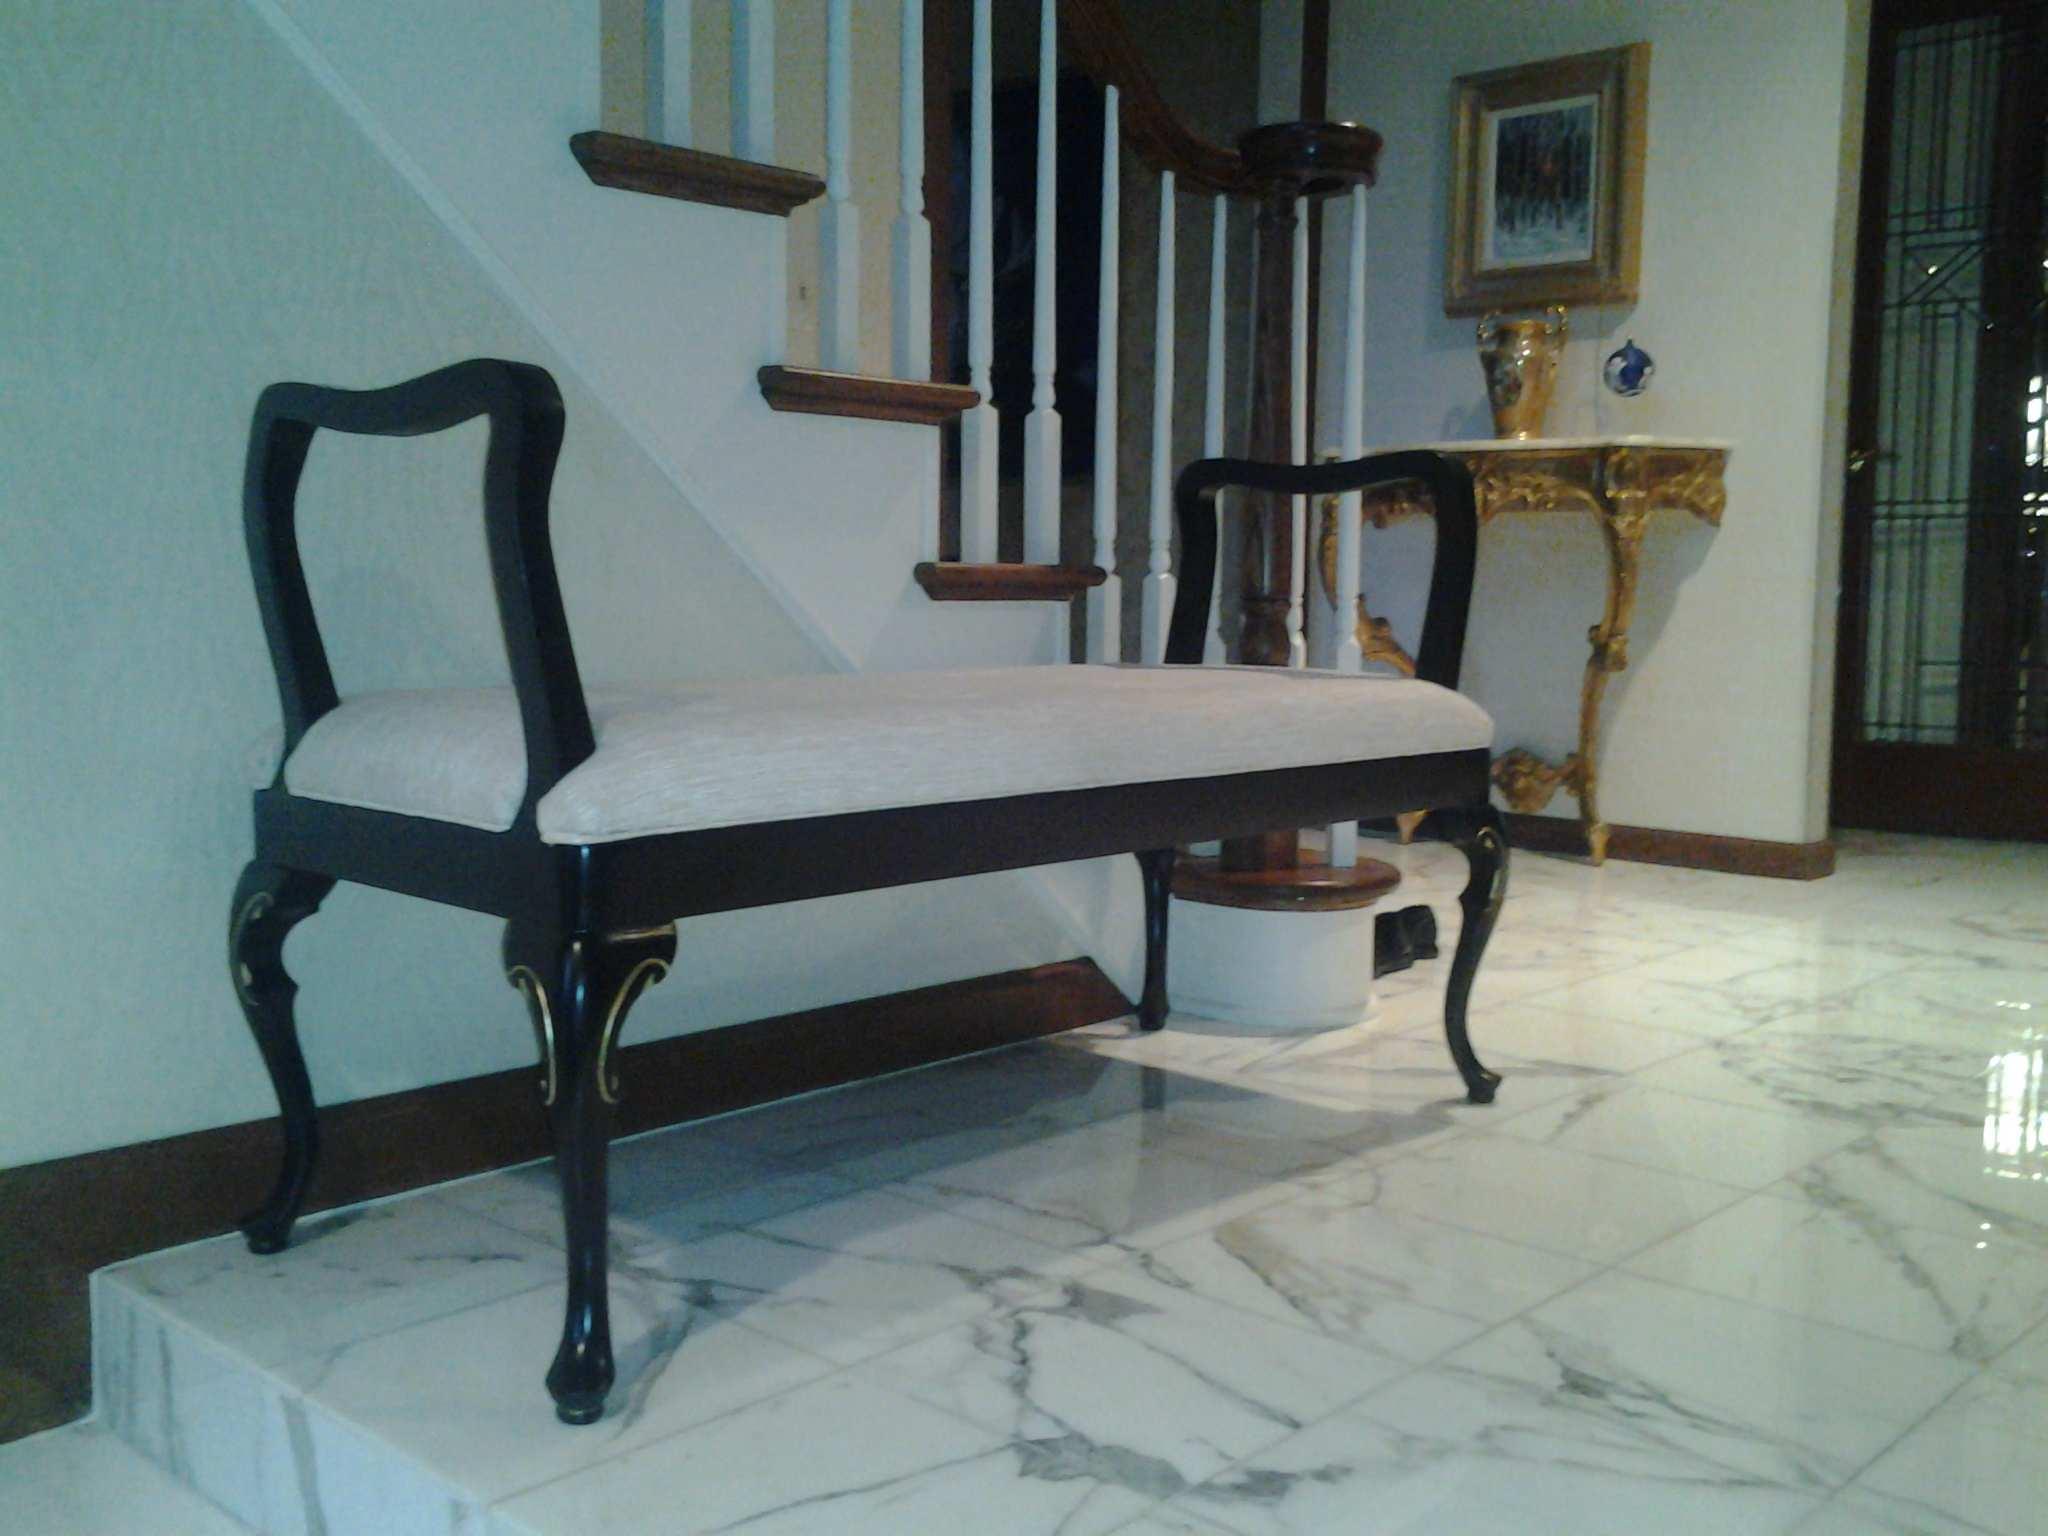 Black and cream bench